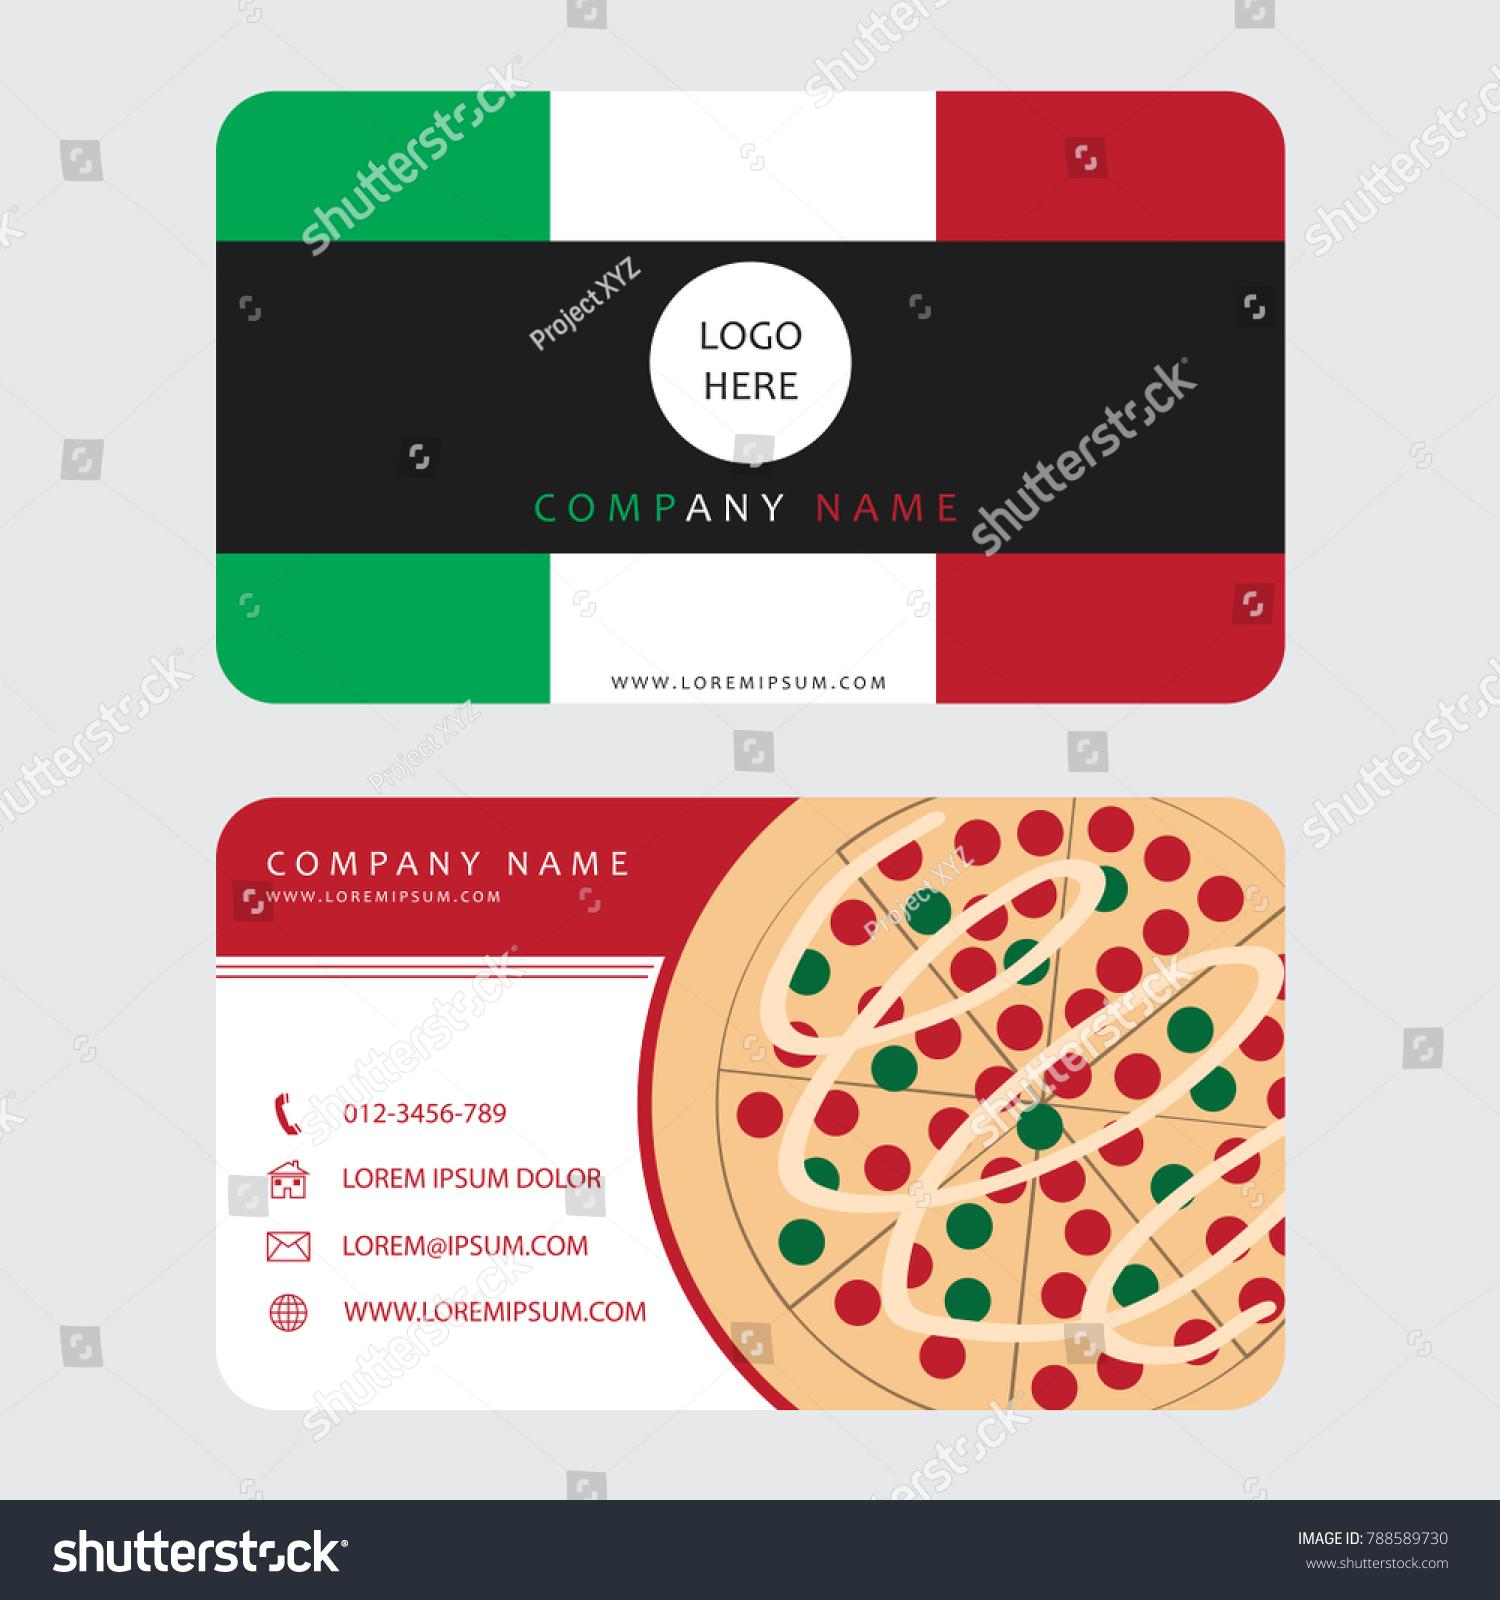 Business Card Pizza Restaurant Decorated Italian Stock Vector ...